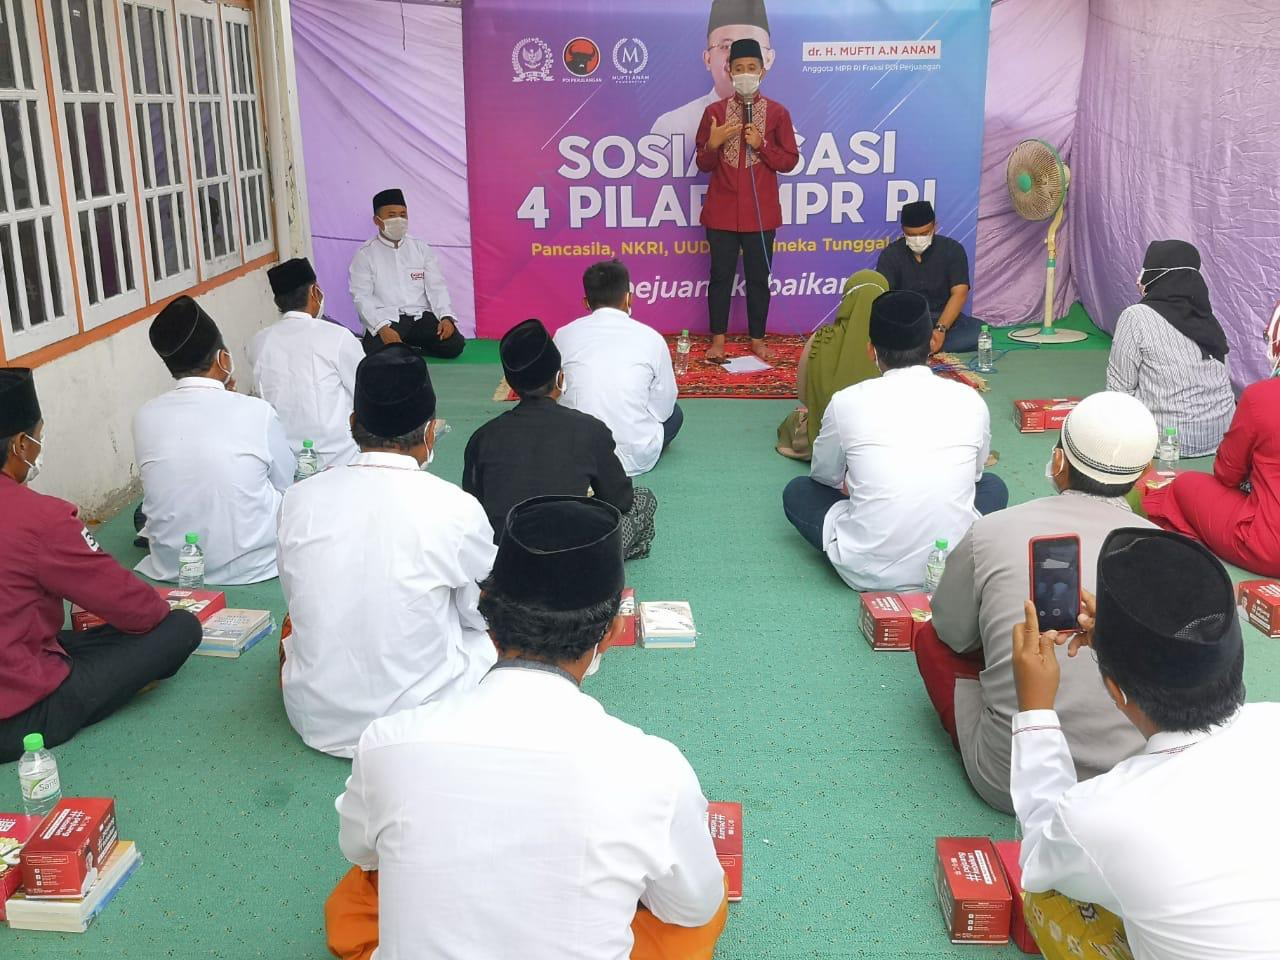 Setahun Lebih Pandemi, Mufti Anam: 4 Pilar Kebangsaan Jadi Modal Lewati Masa Sulit